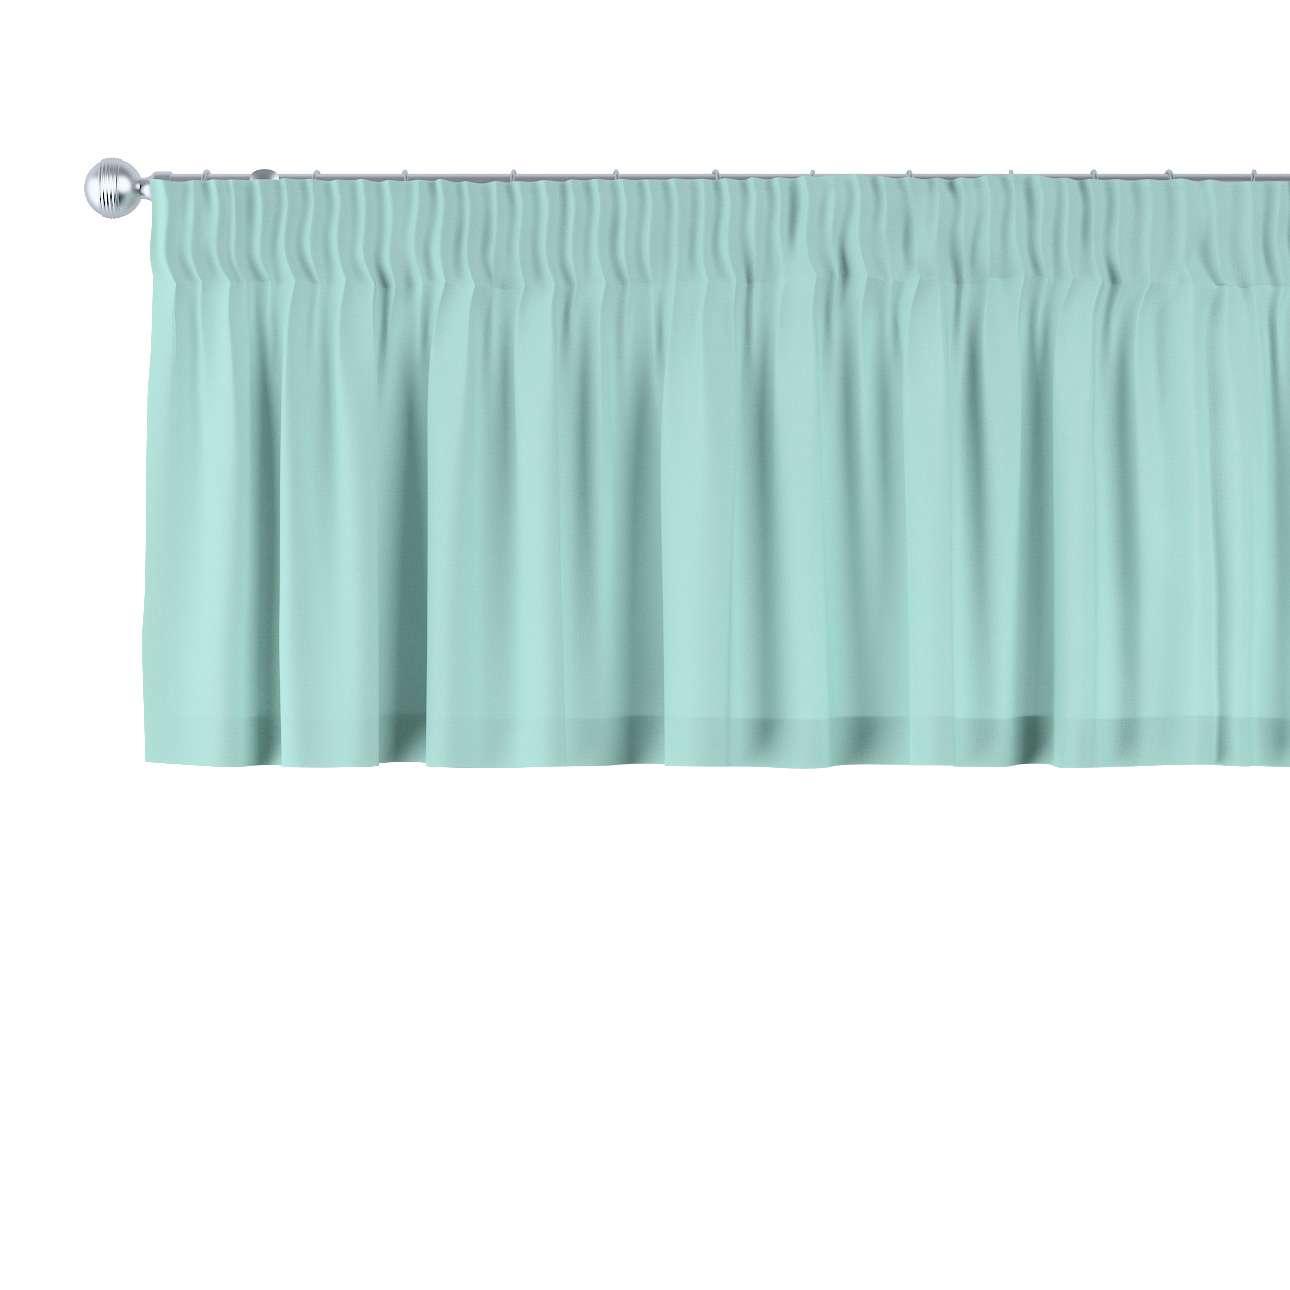 Pencil pleat pelmet 130 x 40 cm (51 x 16 inch) in collection Loneta , fabric: 133-32